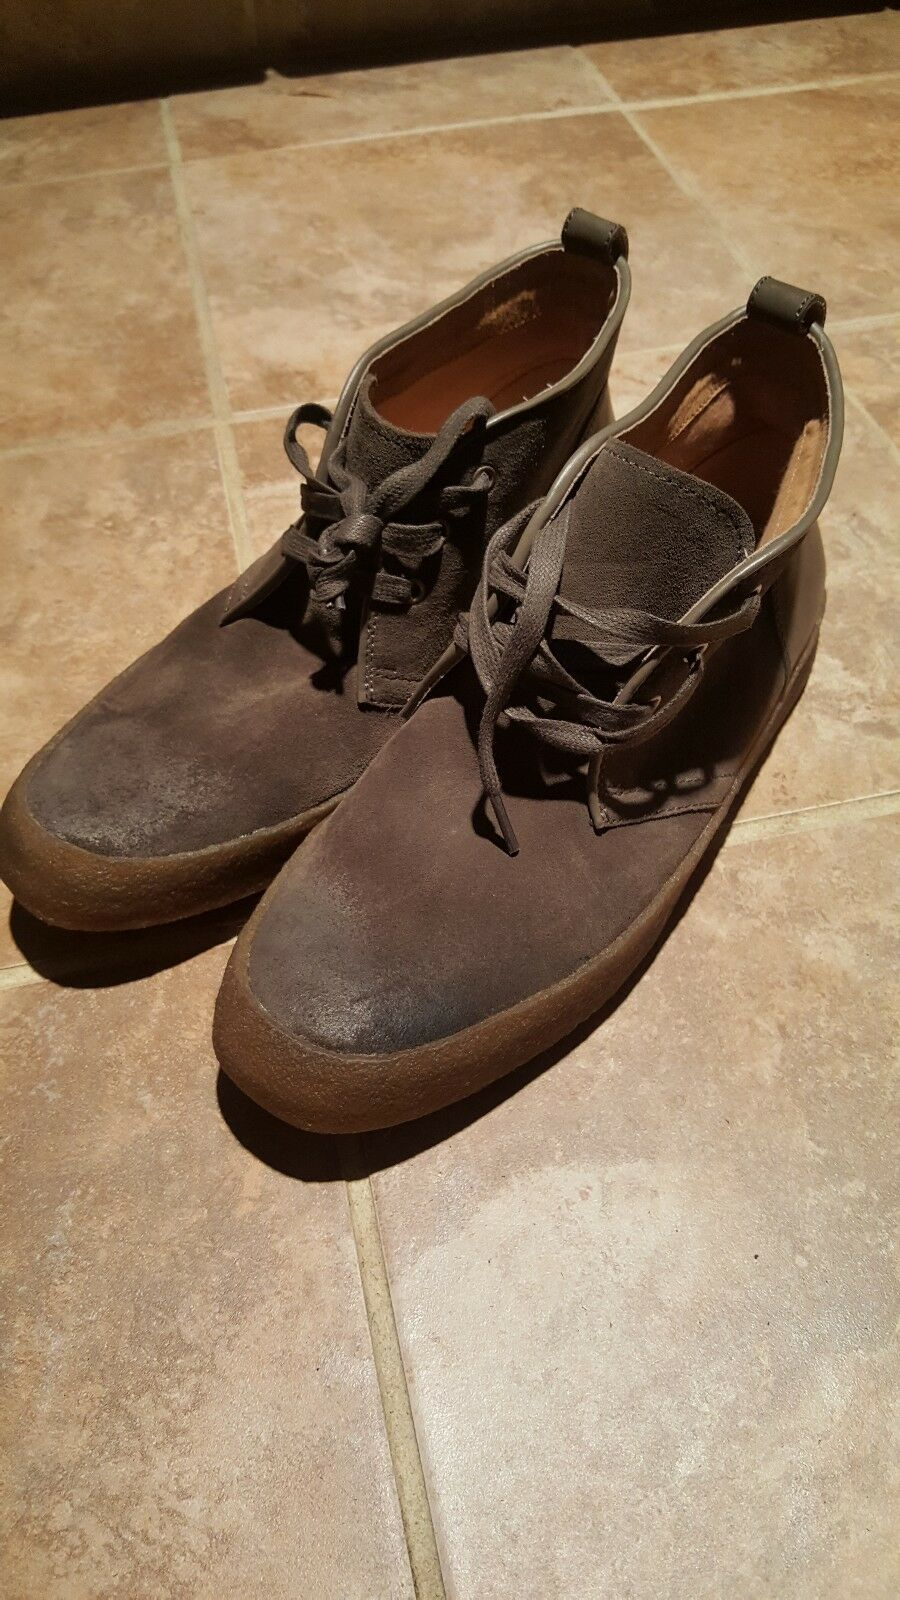 Men JOHN VARVATOS suede TIE Up Ankle Boots SIZE 9.5 M NWOB